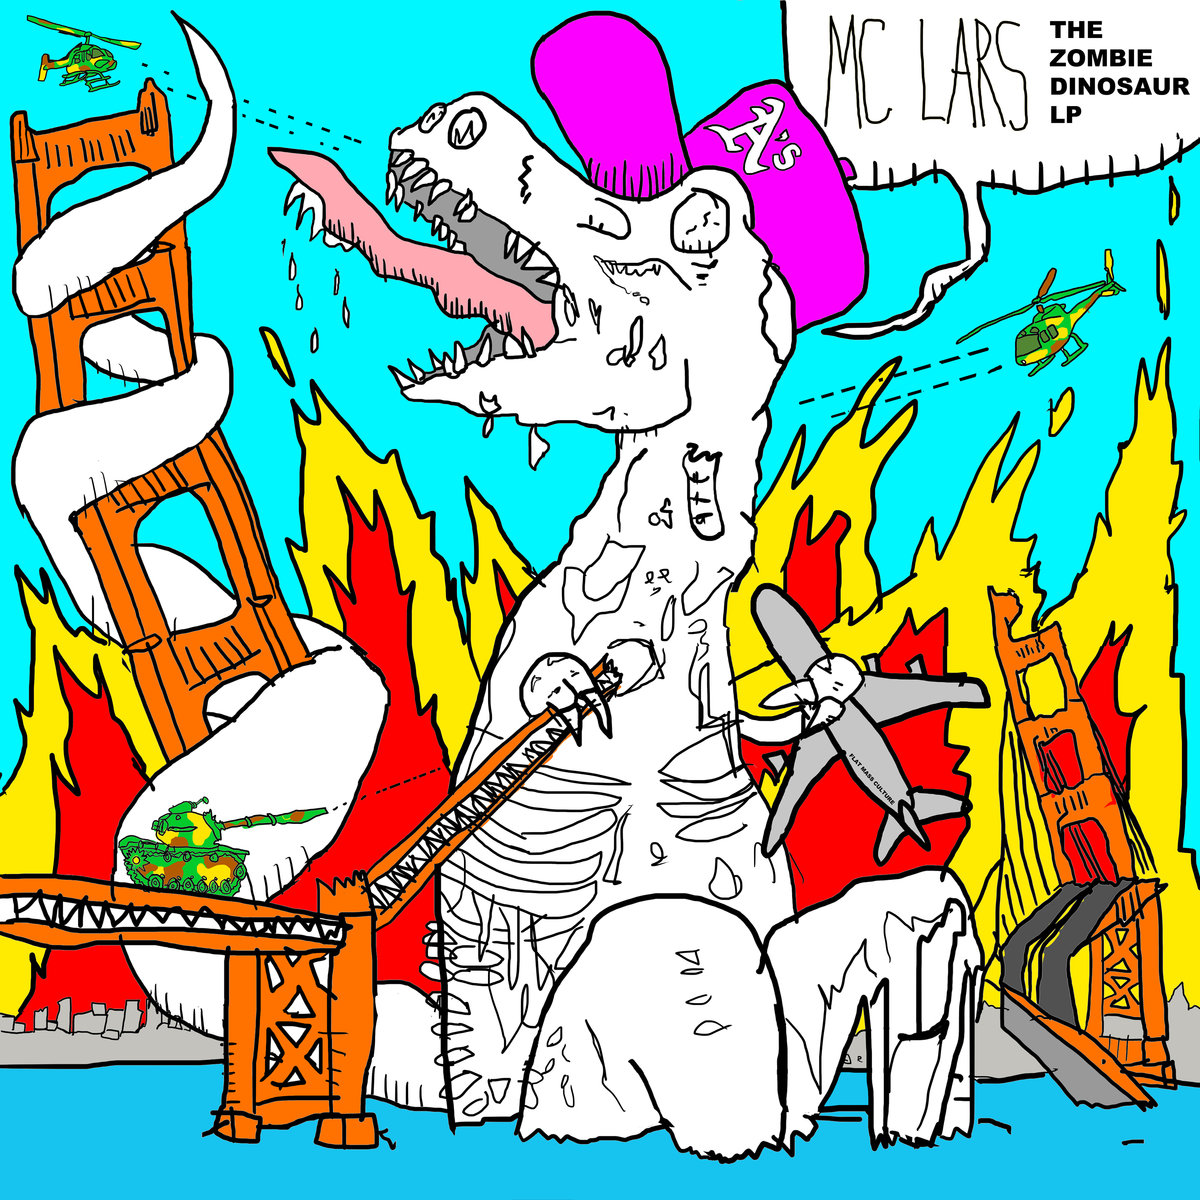 MC Lars - The Zombie Dinosaur LP